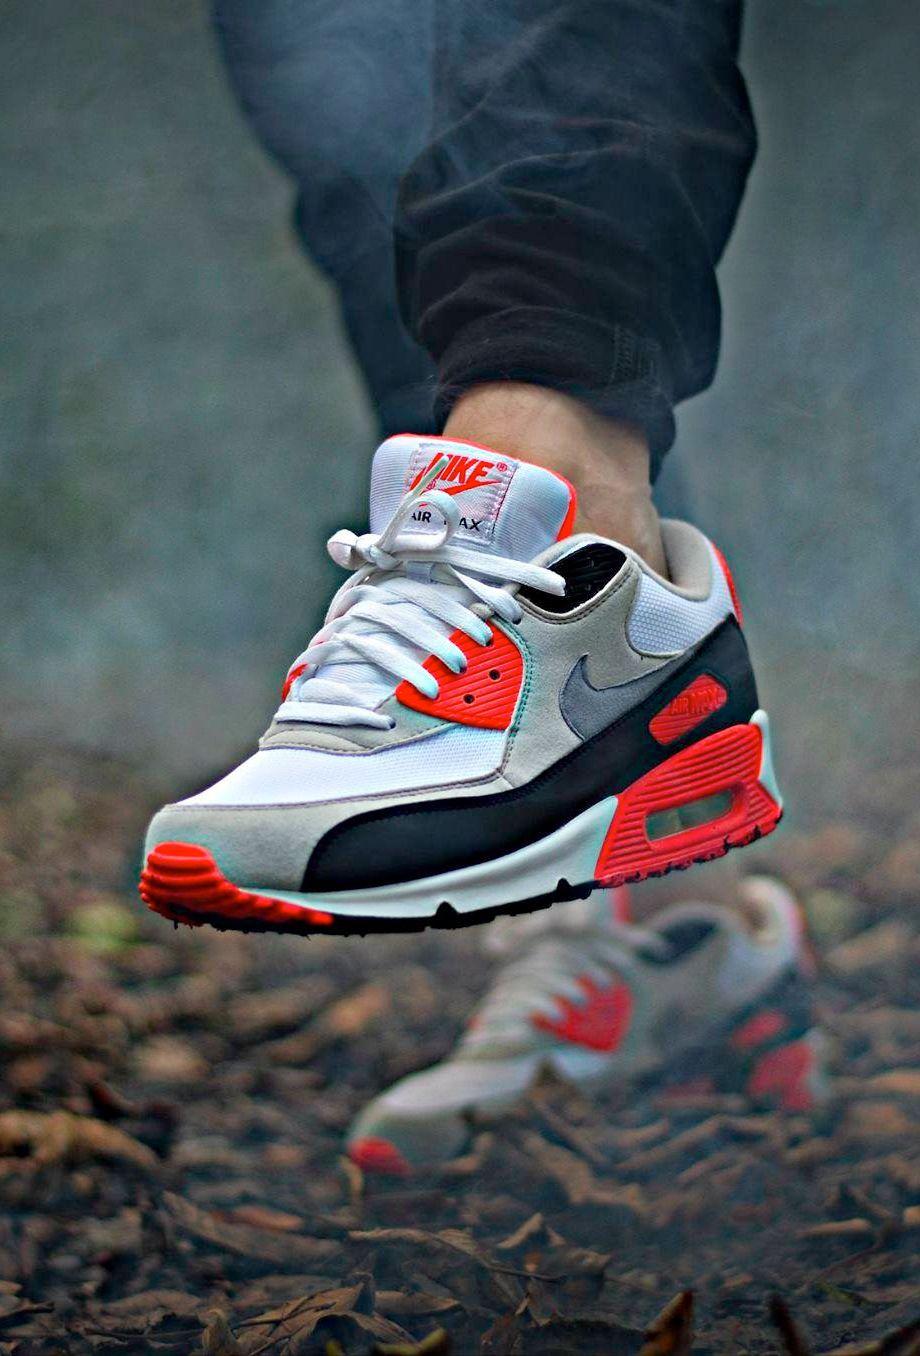 c6af46563852 Nike Air Max 90 Infrared 1 http   sneakeraddict.net Air Max Sneakers